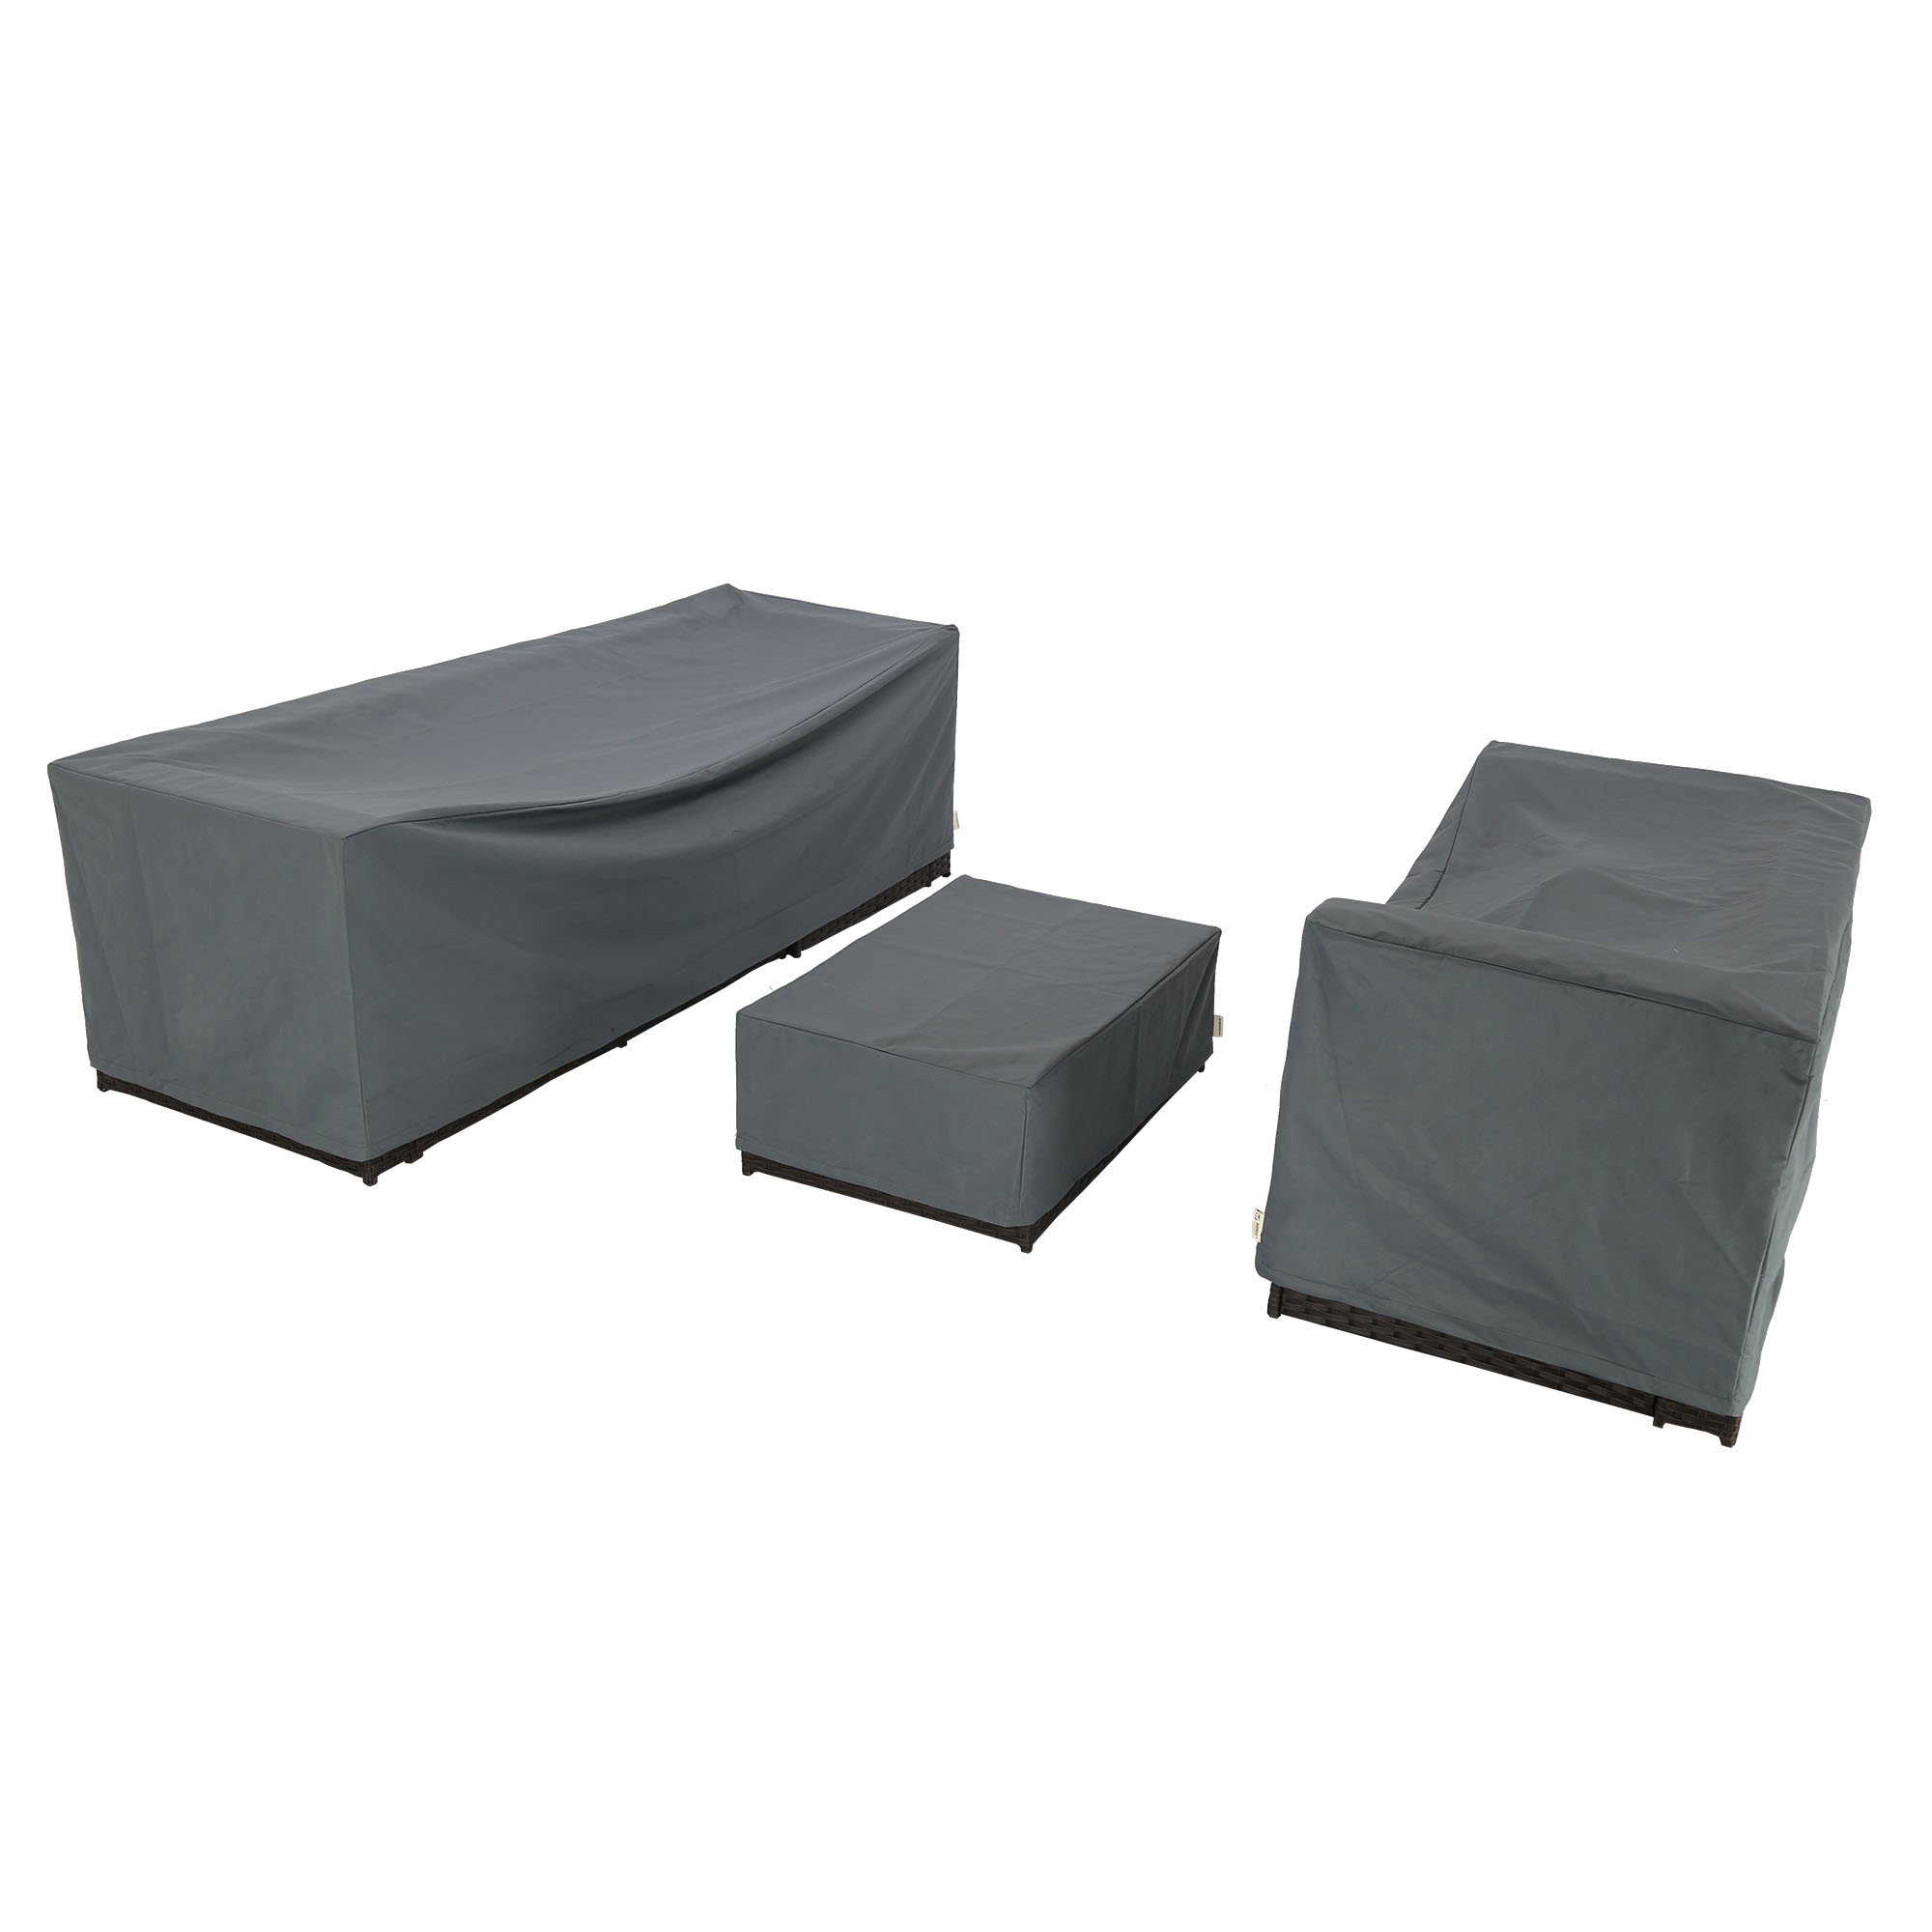 Baner Garden K35 3-Piece Outdoor Veranda Patio Garden Furniture Cover Set with Durable and Water Resistant Fabric